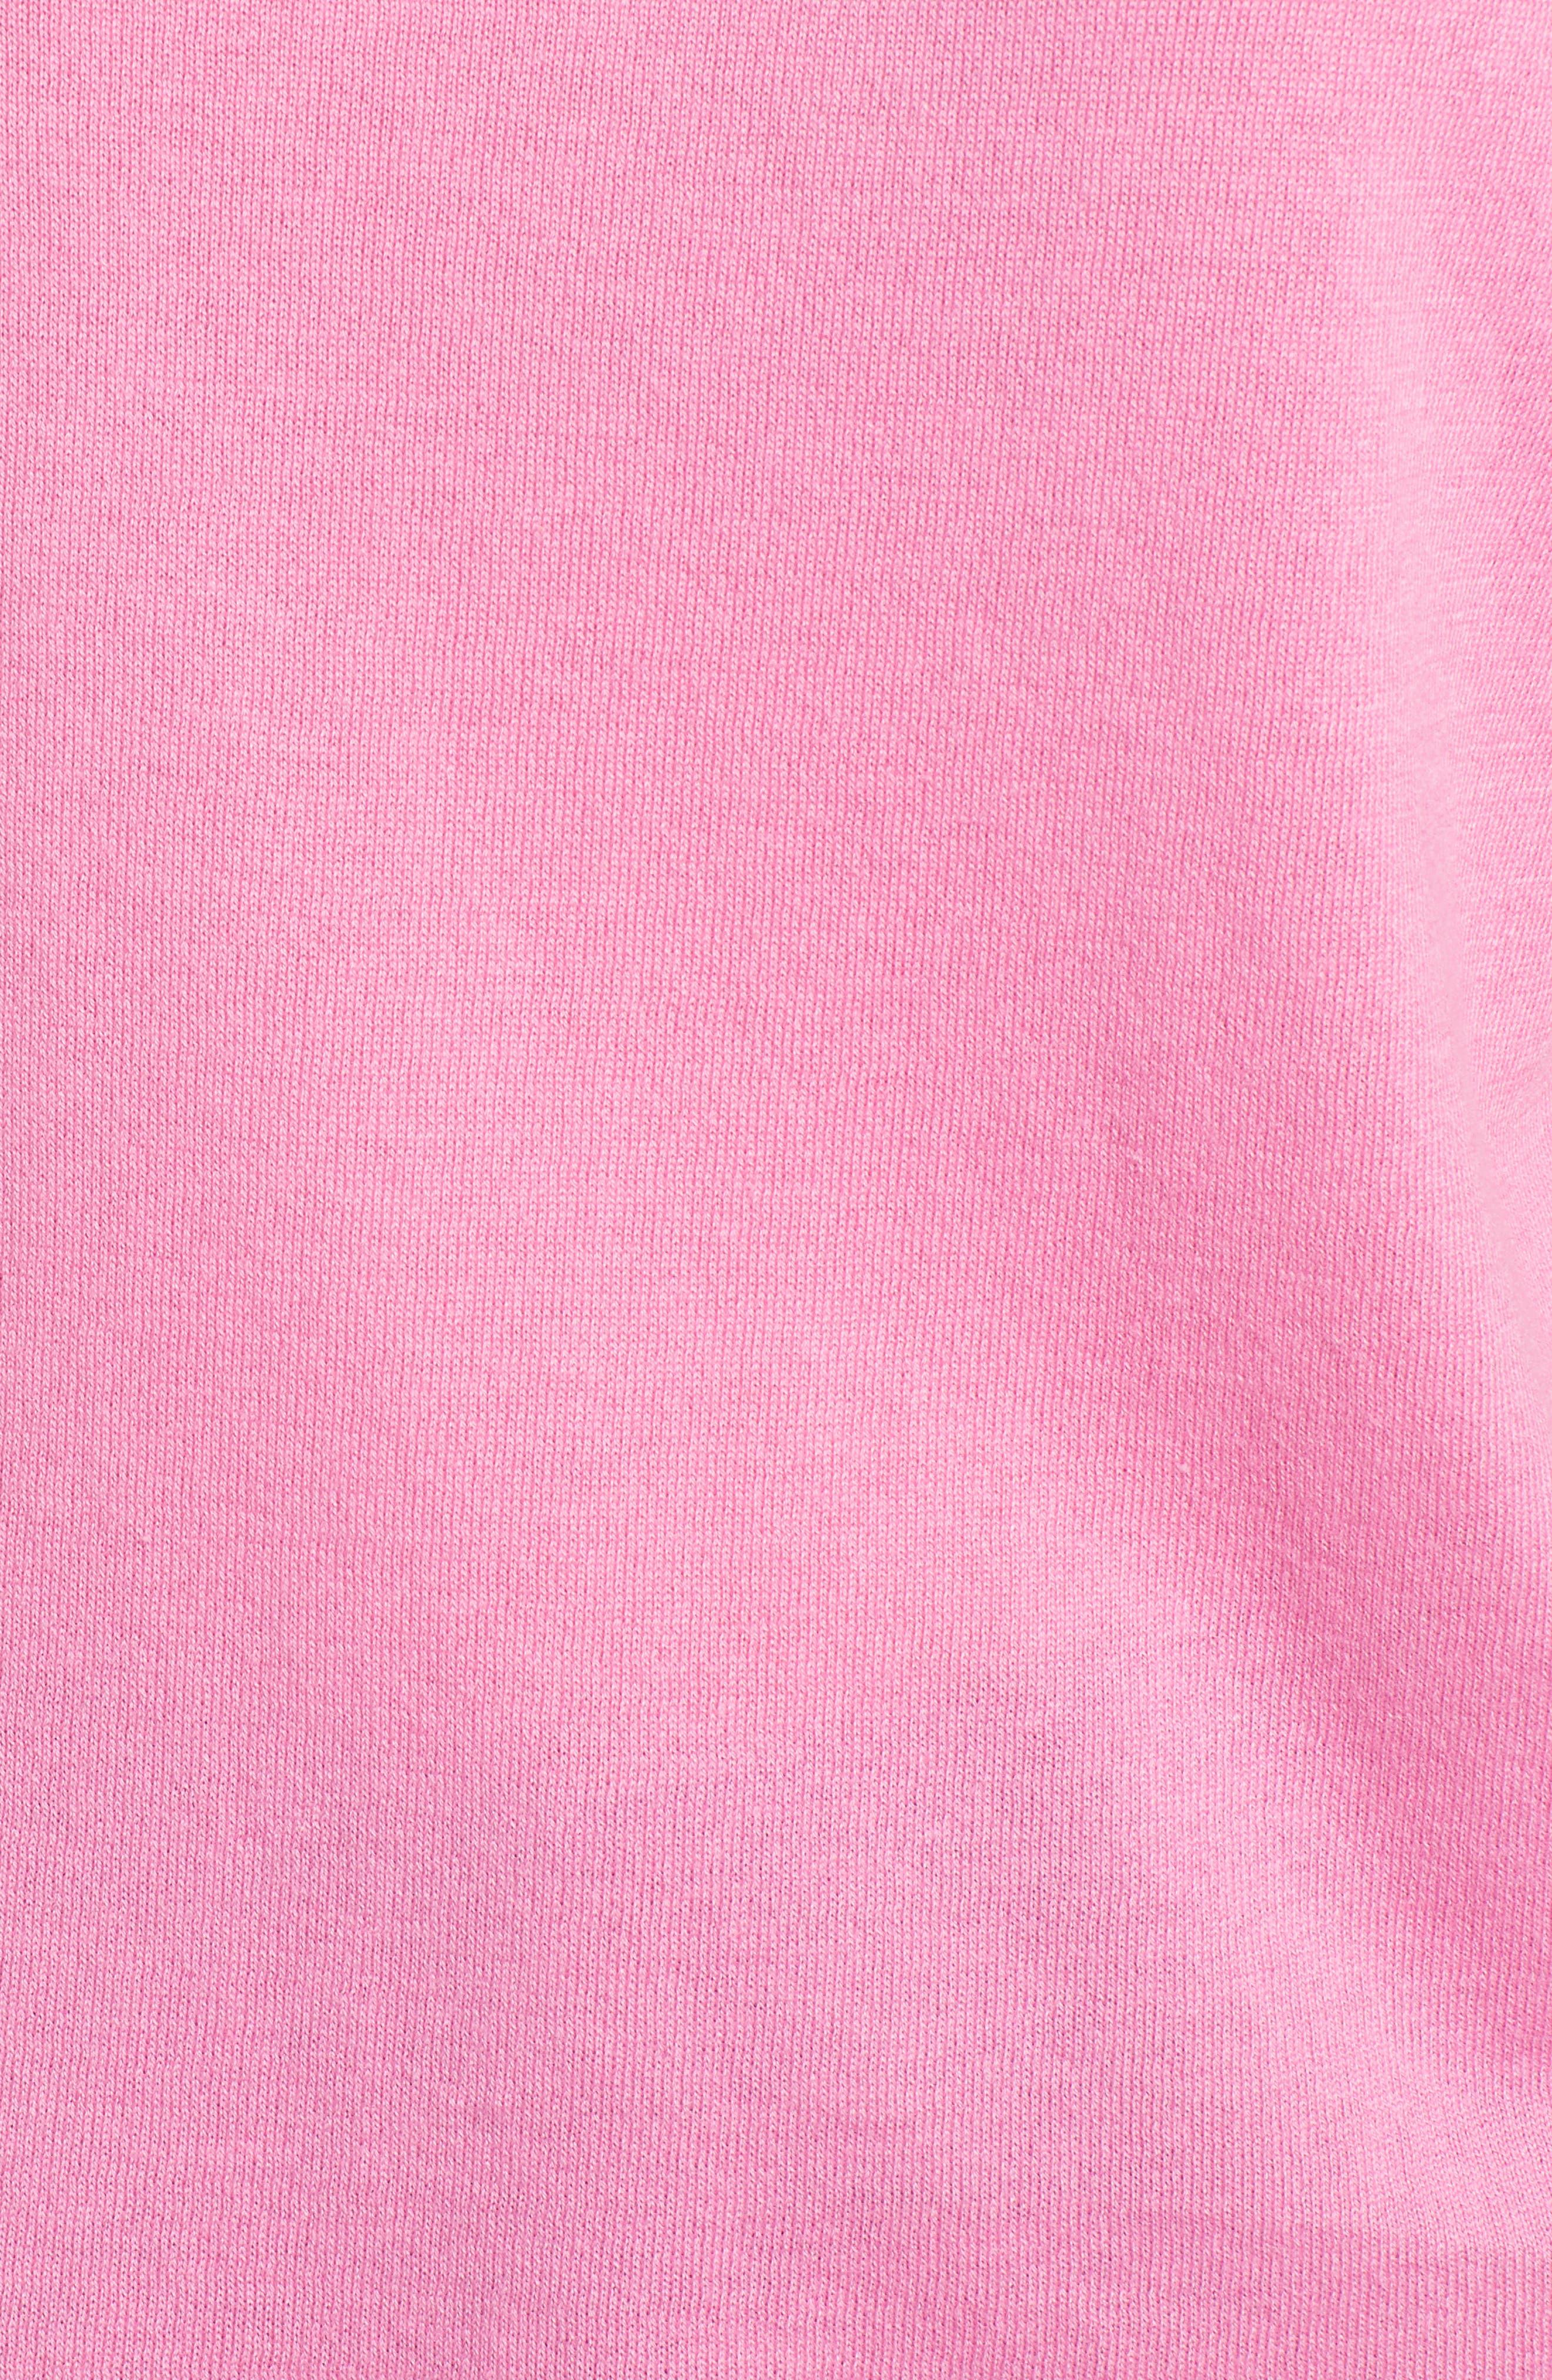 Lightweight Sweater,                             Alternate thumbnail 25, color,